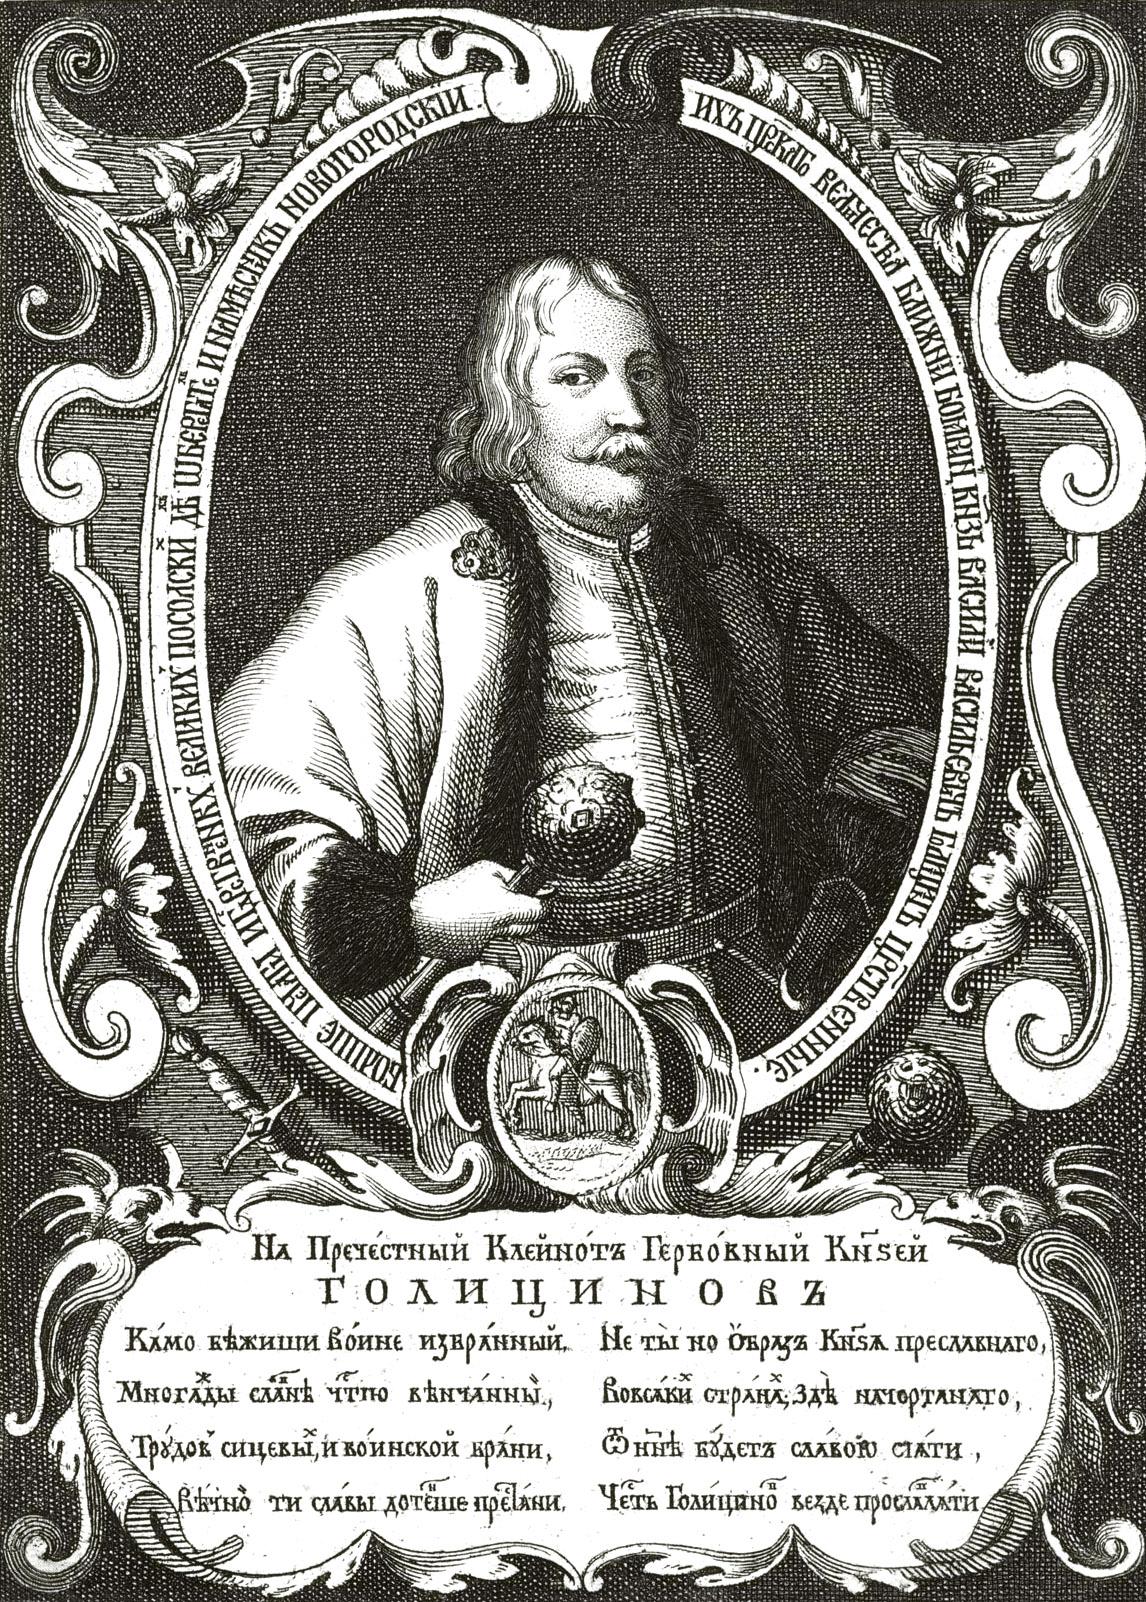 4. Портрет Князя Василия Васильевича Голицына